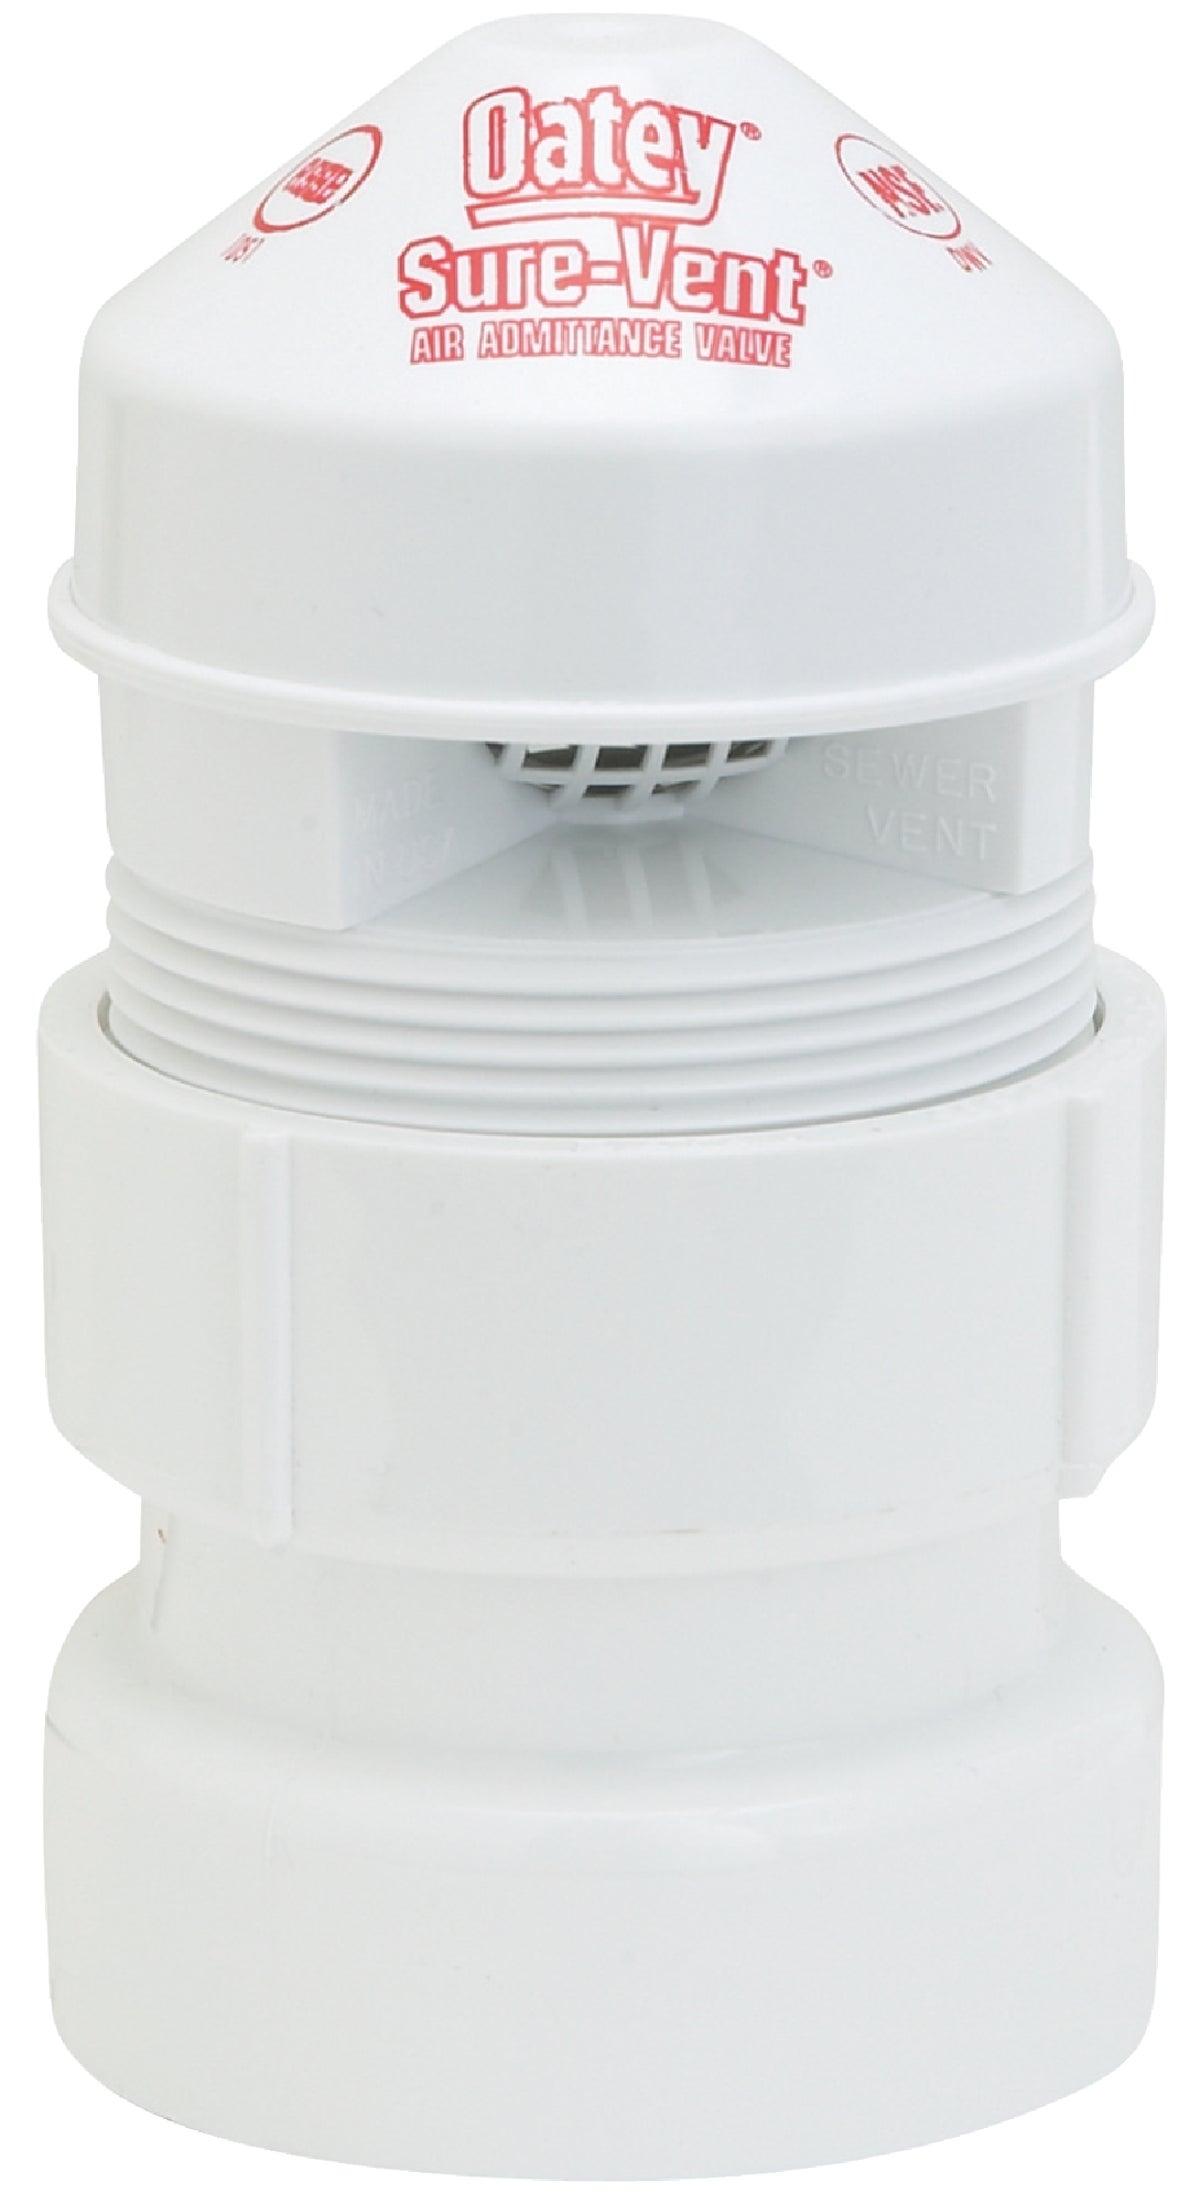 "6 Pk Oatey Sure Vent 1-1//2/"" Solvent Weld PVC Air Admittance Valve Kit 39239"